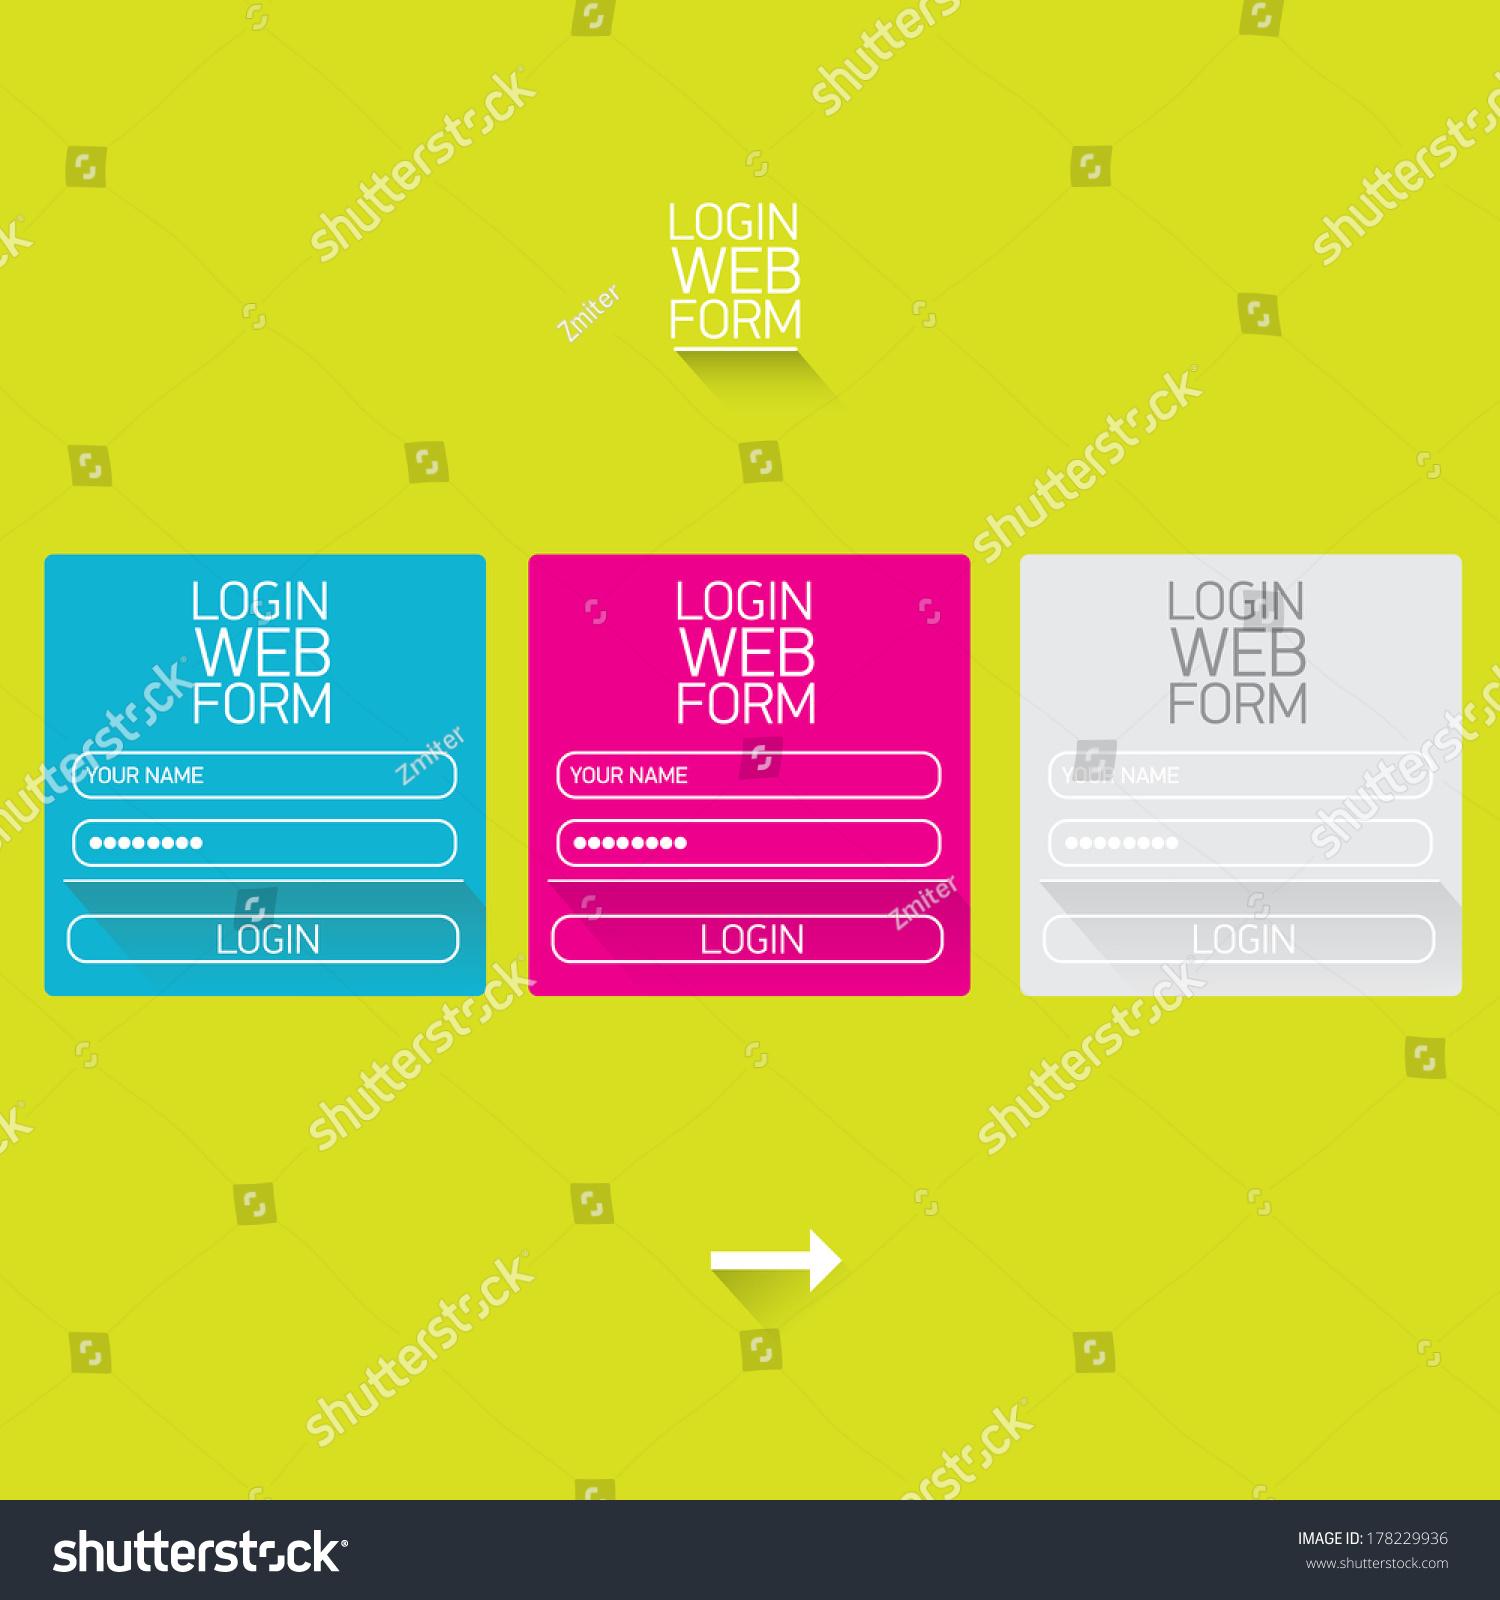 vector login website template flat design stock vector 178229936 shutterstock. Black Bedroom Furniture Sets. Home Design Ideas